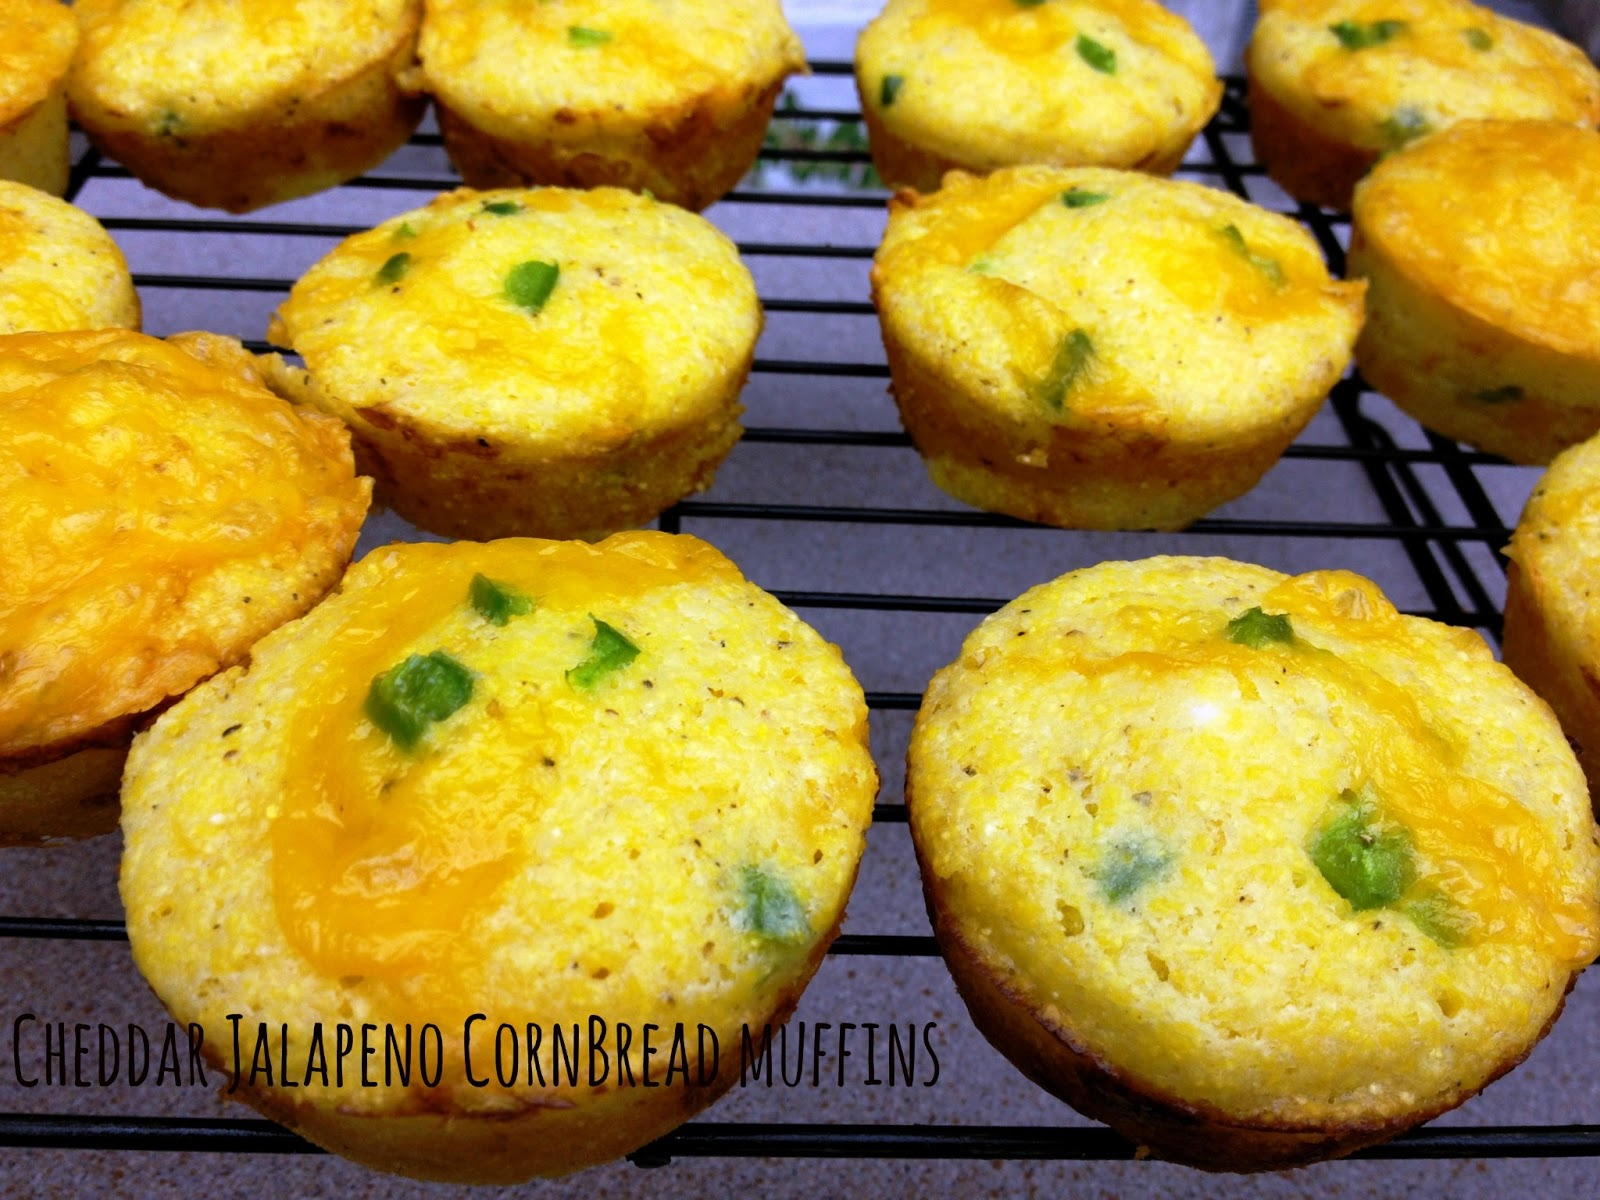 Cooking Quidnunc: Cheddar Jalapeno Cornbread Muffins